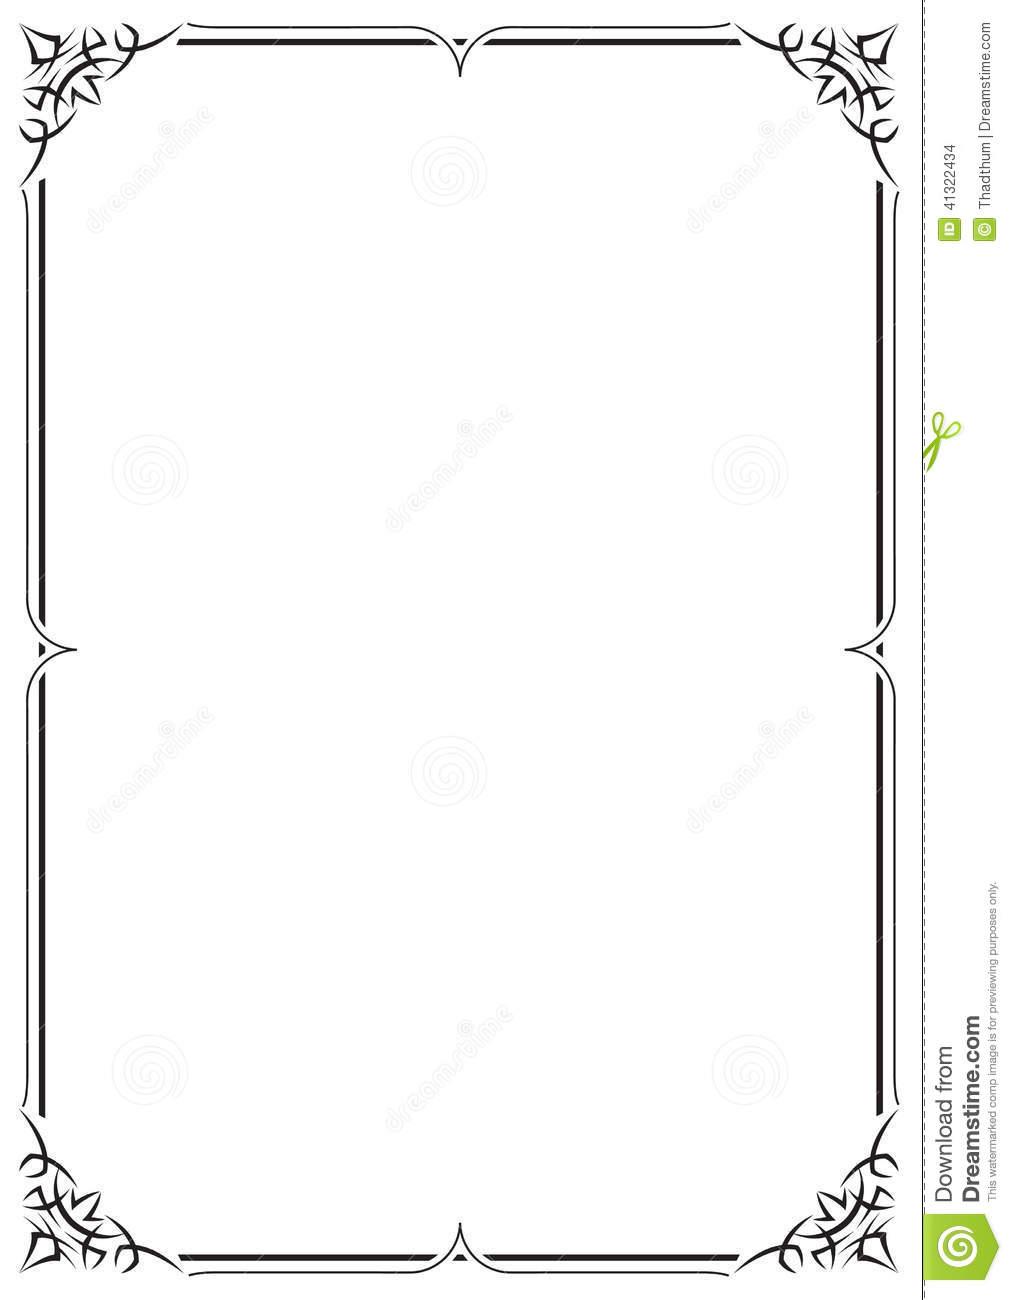 Frame Design Line Art : Abstract lines vector border frame images